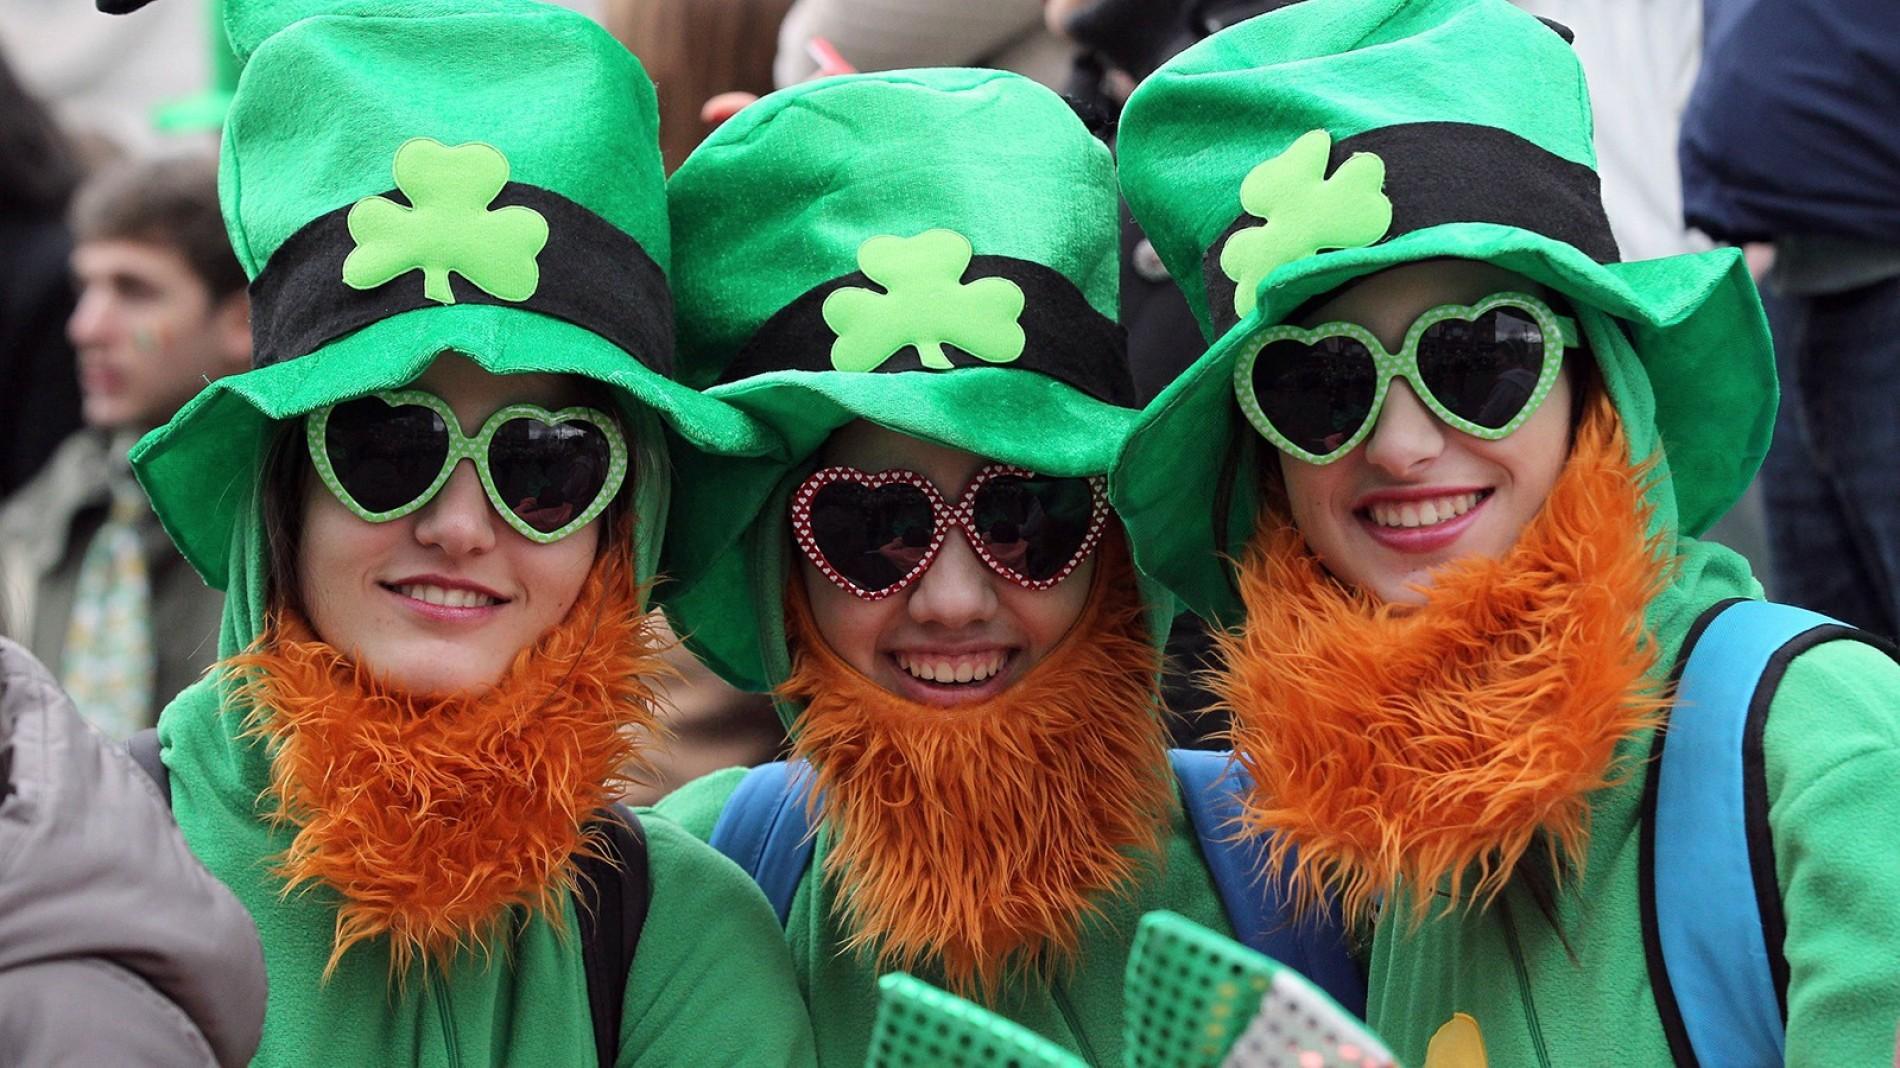 Three girls dressed up for St Patricks Day